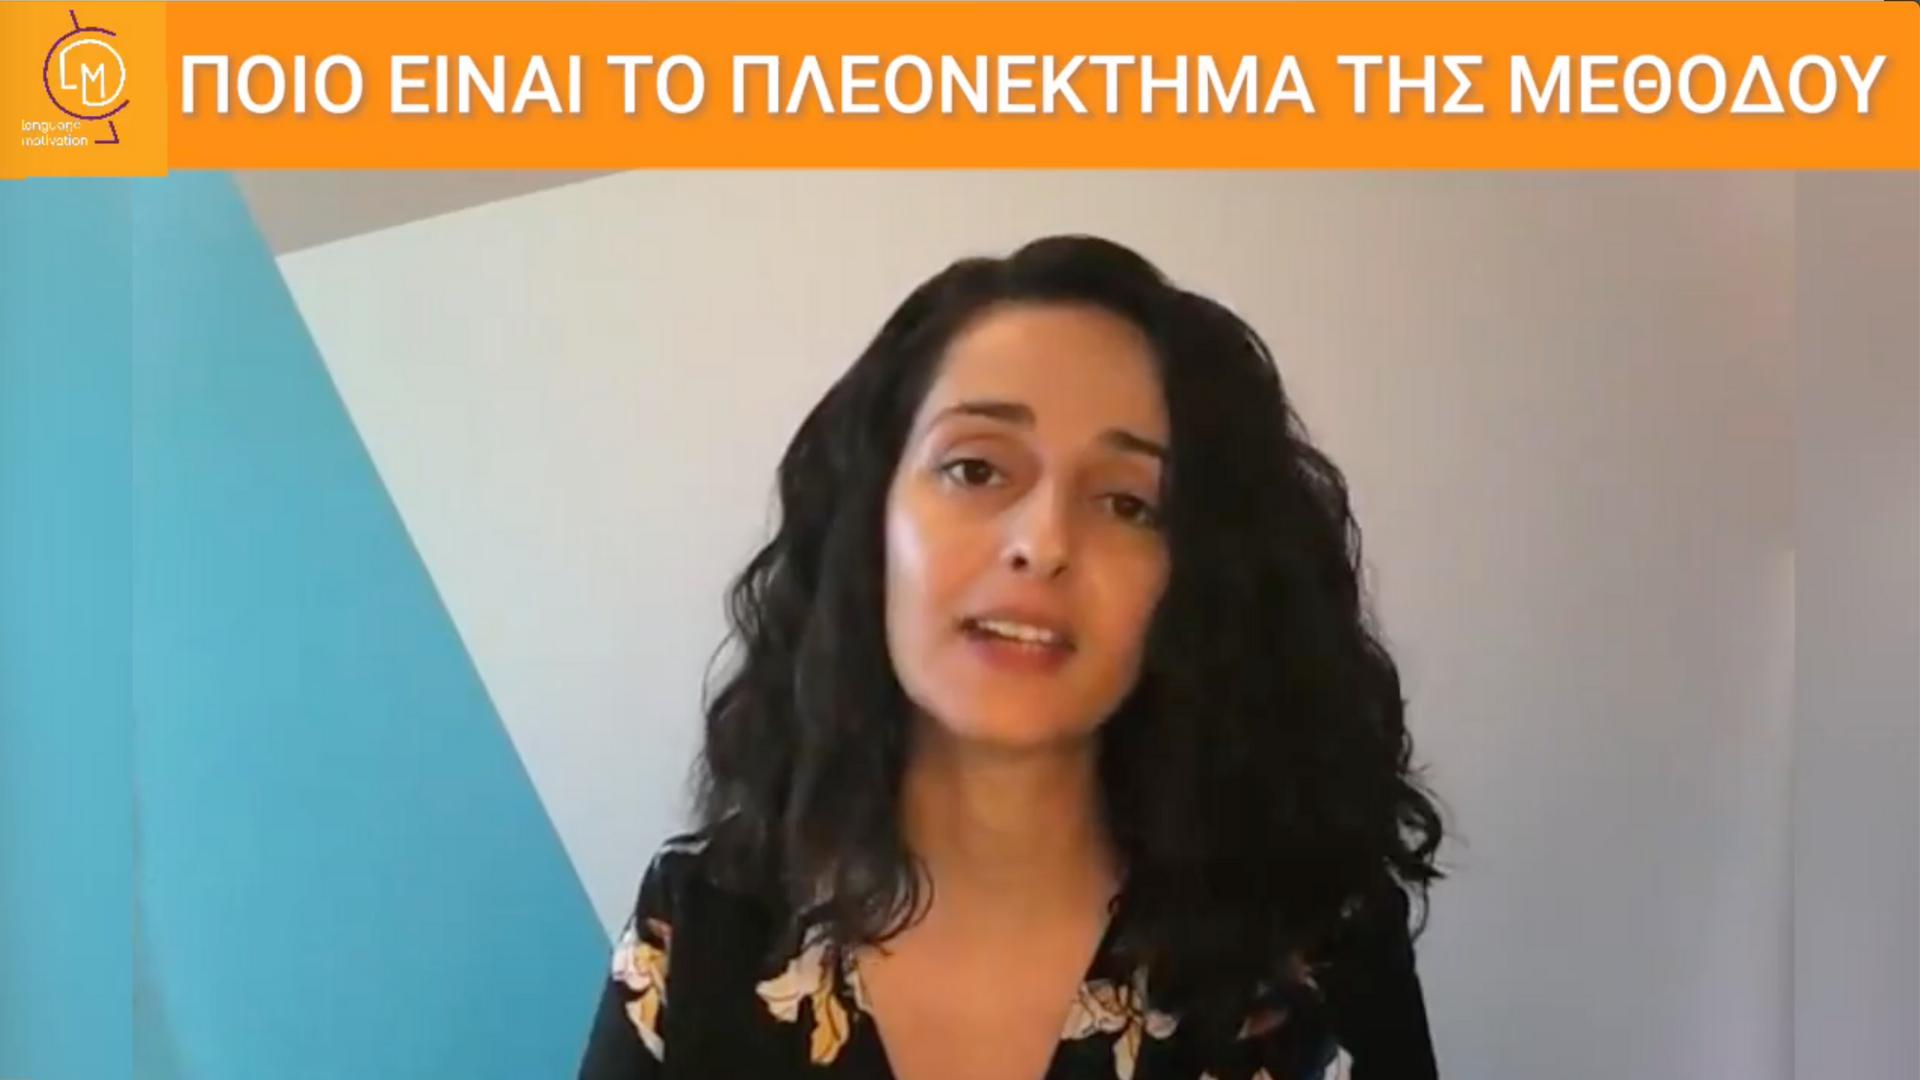 VIDEO: Ποιο είναι το πλεονέκτημα της μεθόδου Language and Motivation